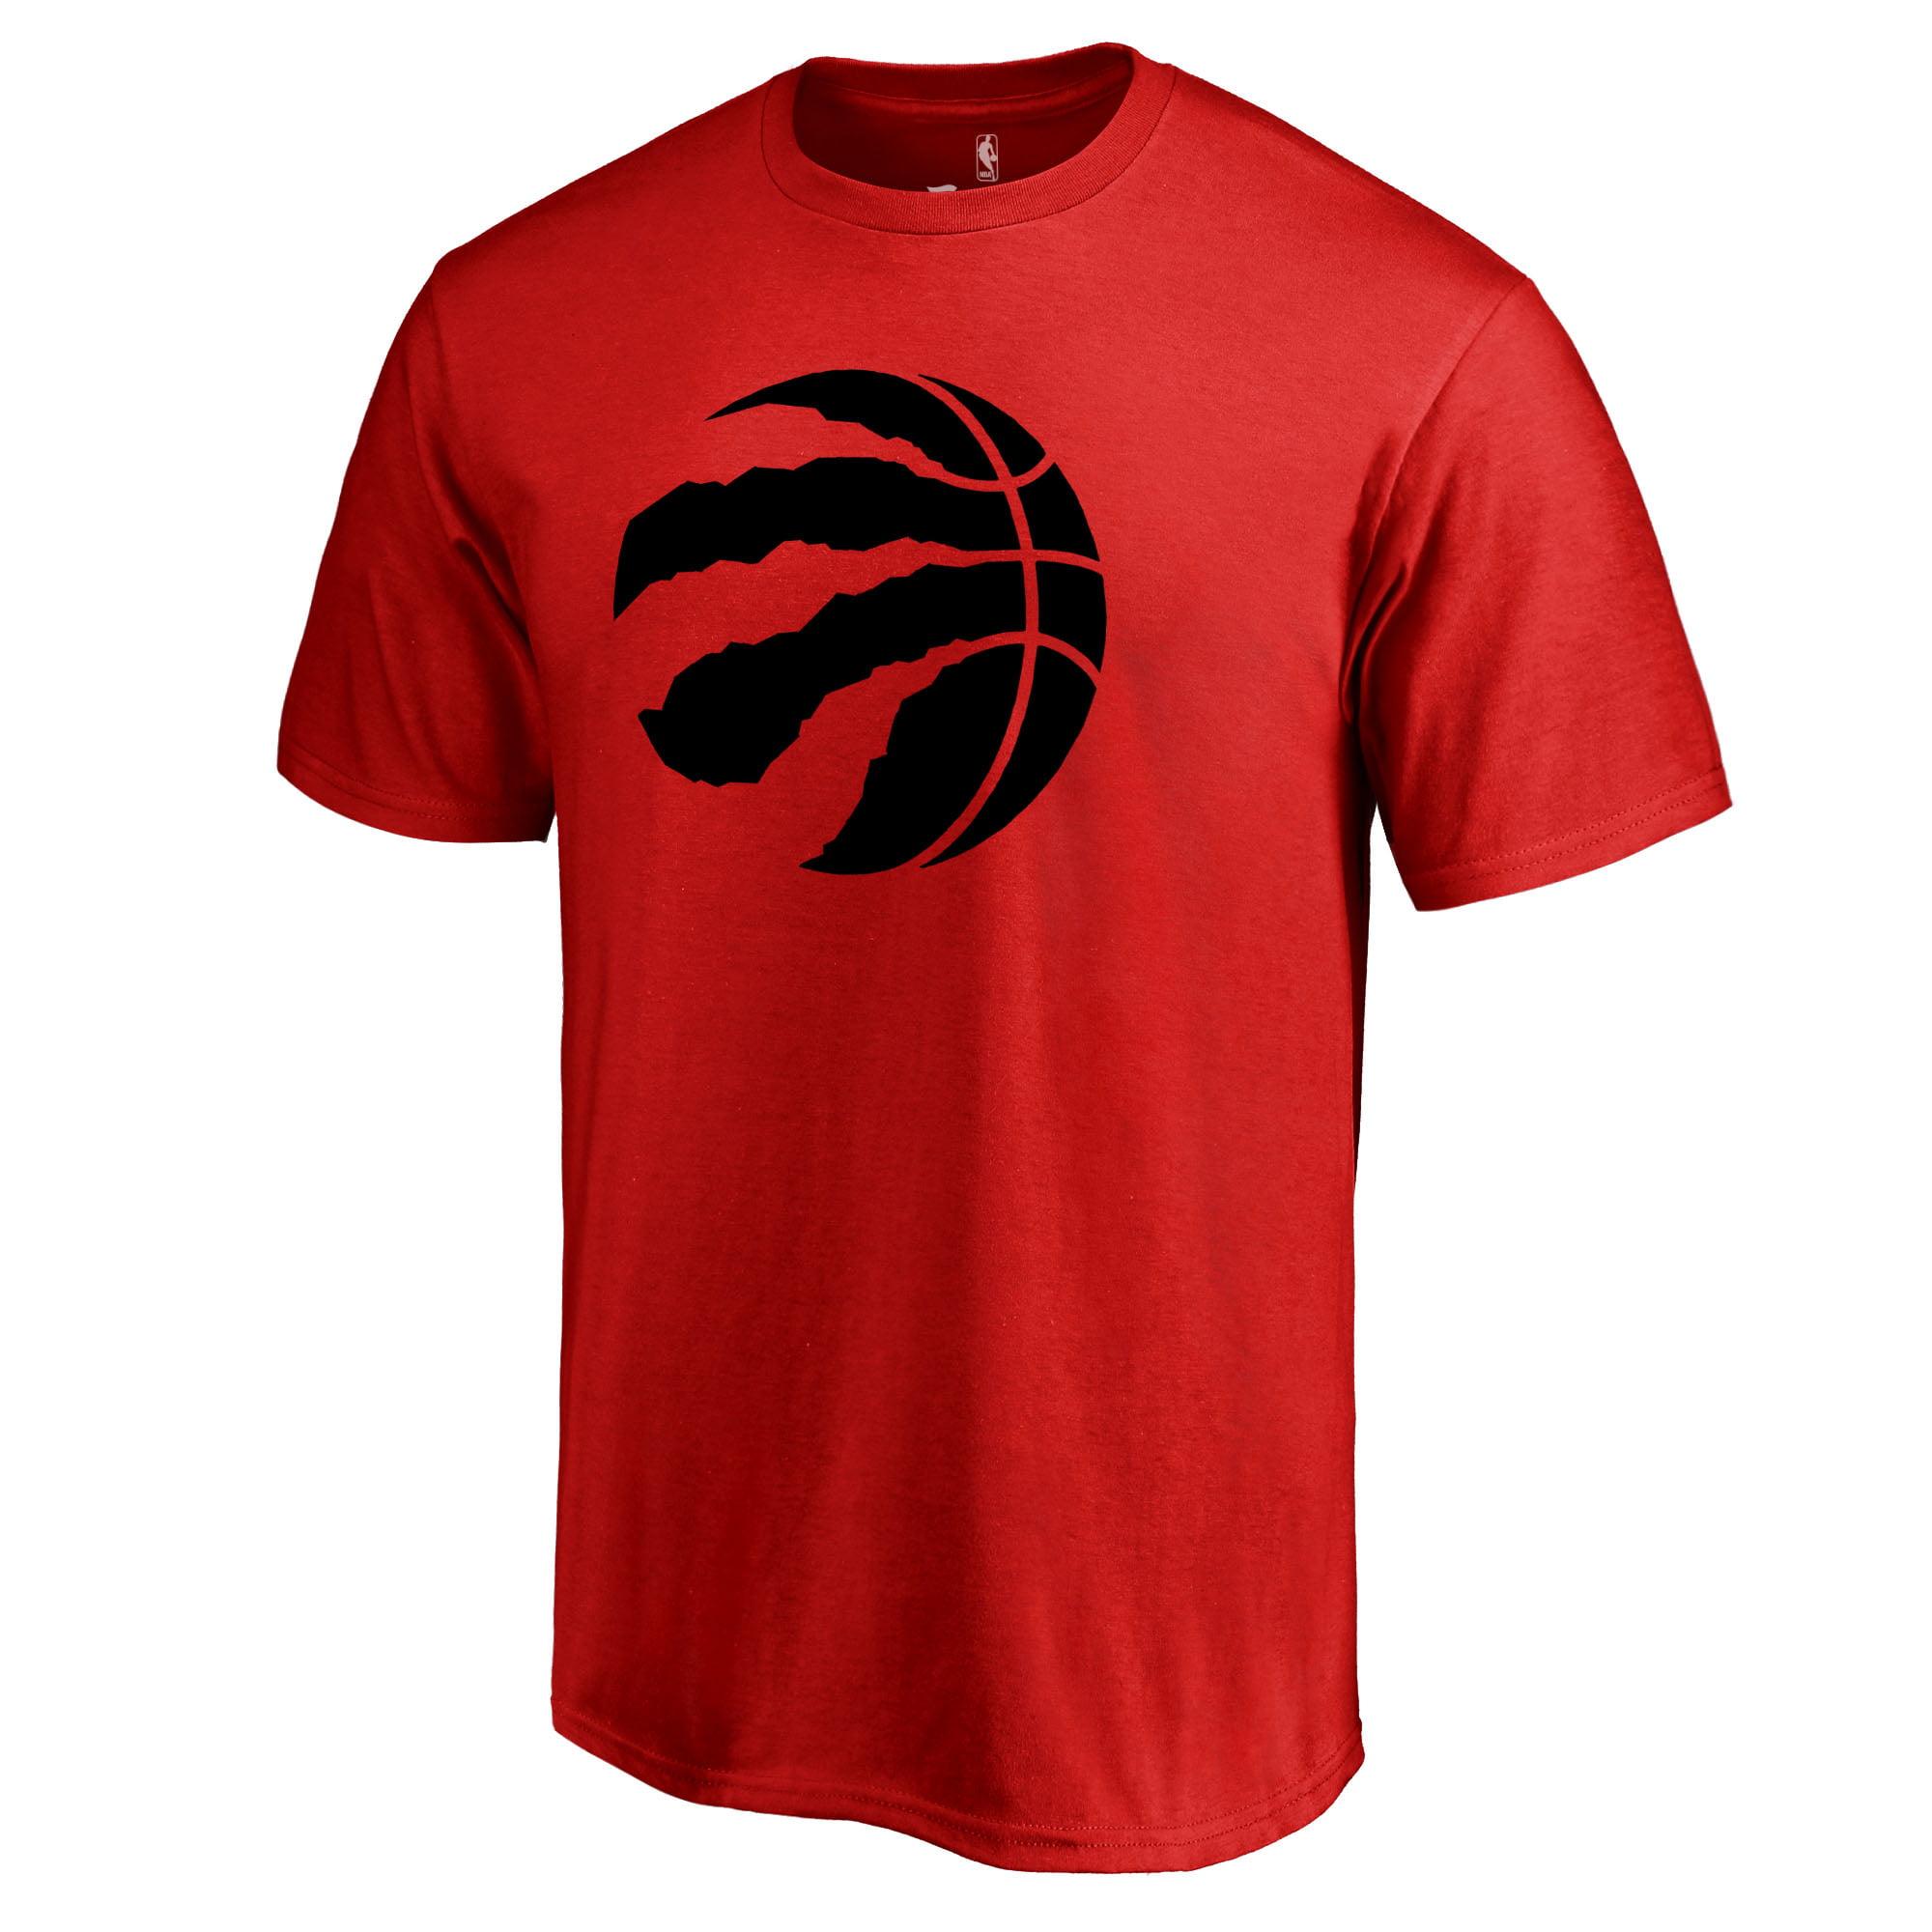 Toronto Raptors Tshirt Toddler T-Shirt Love Watching With Daddy